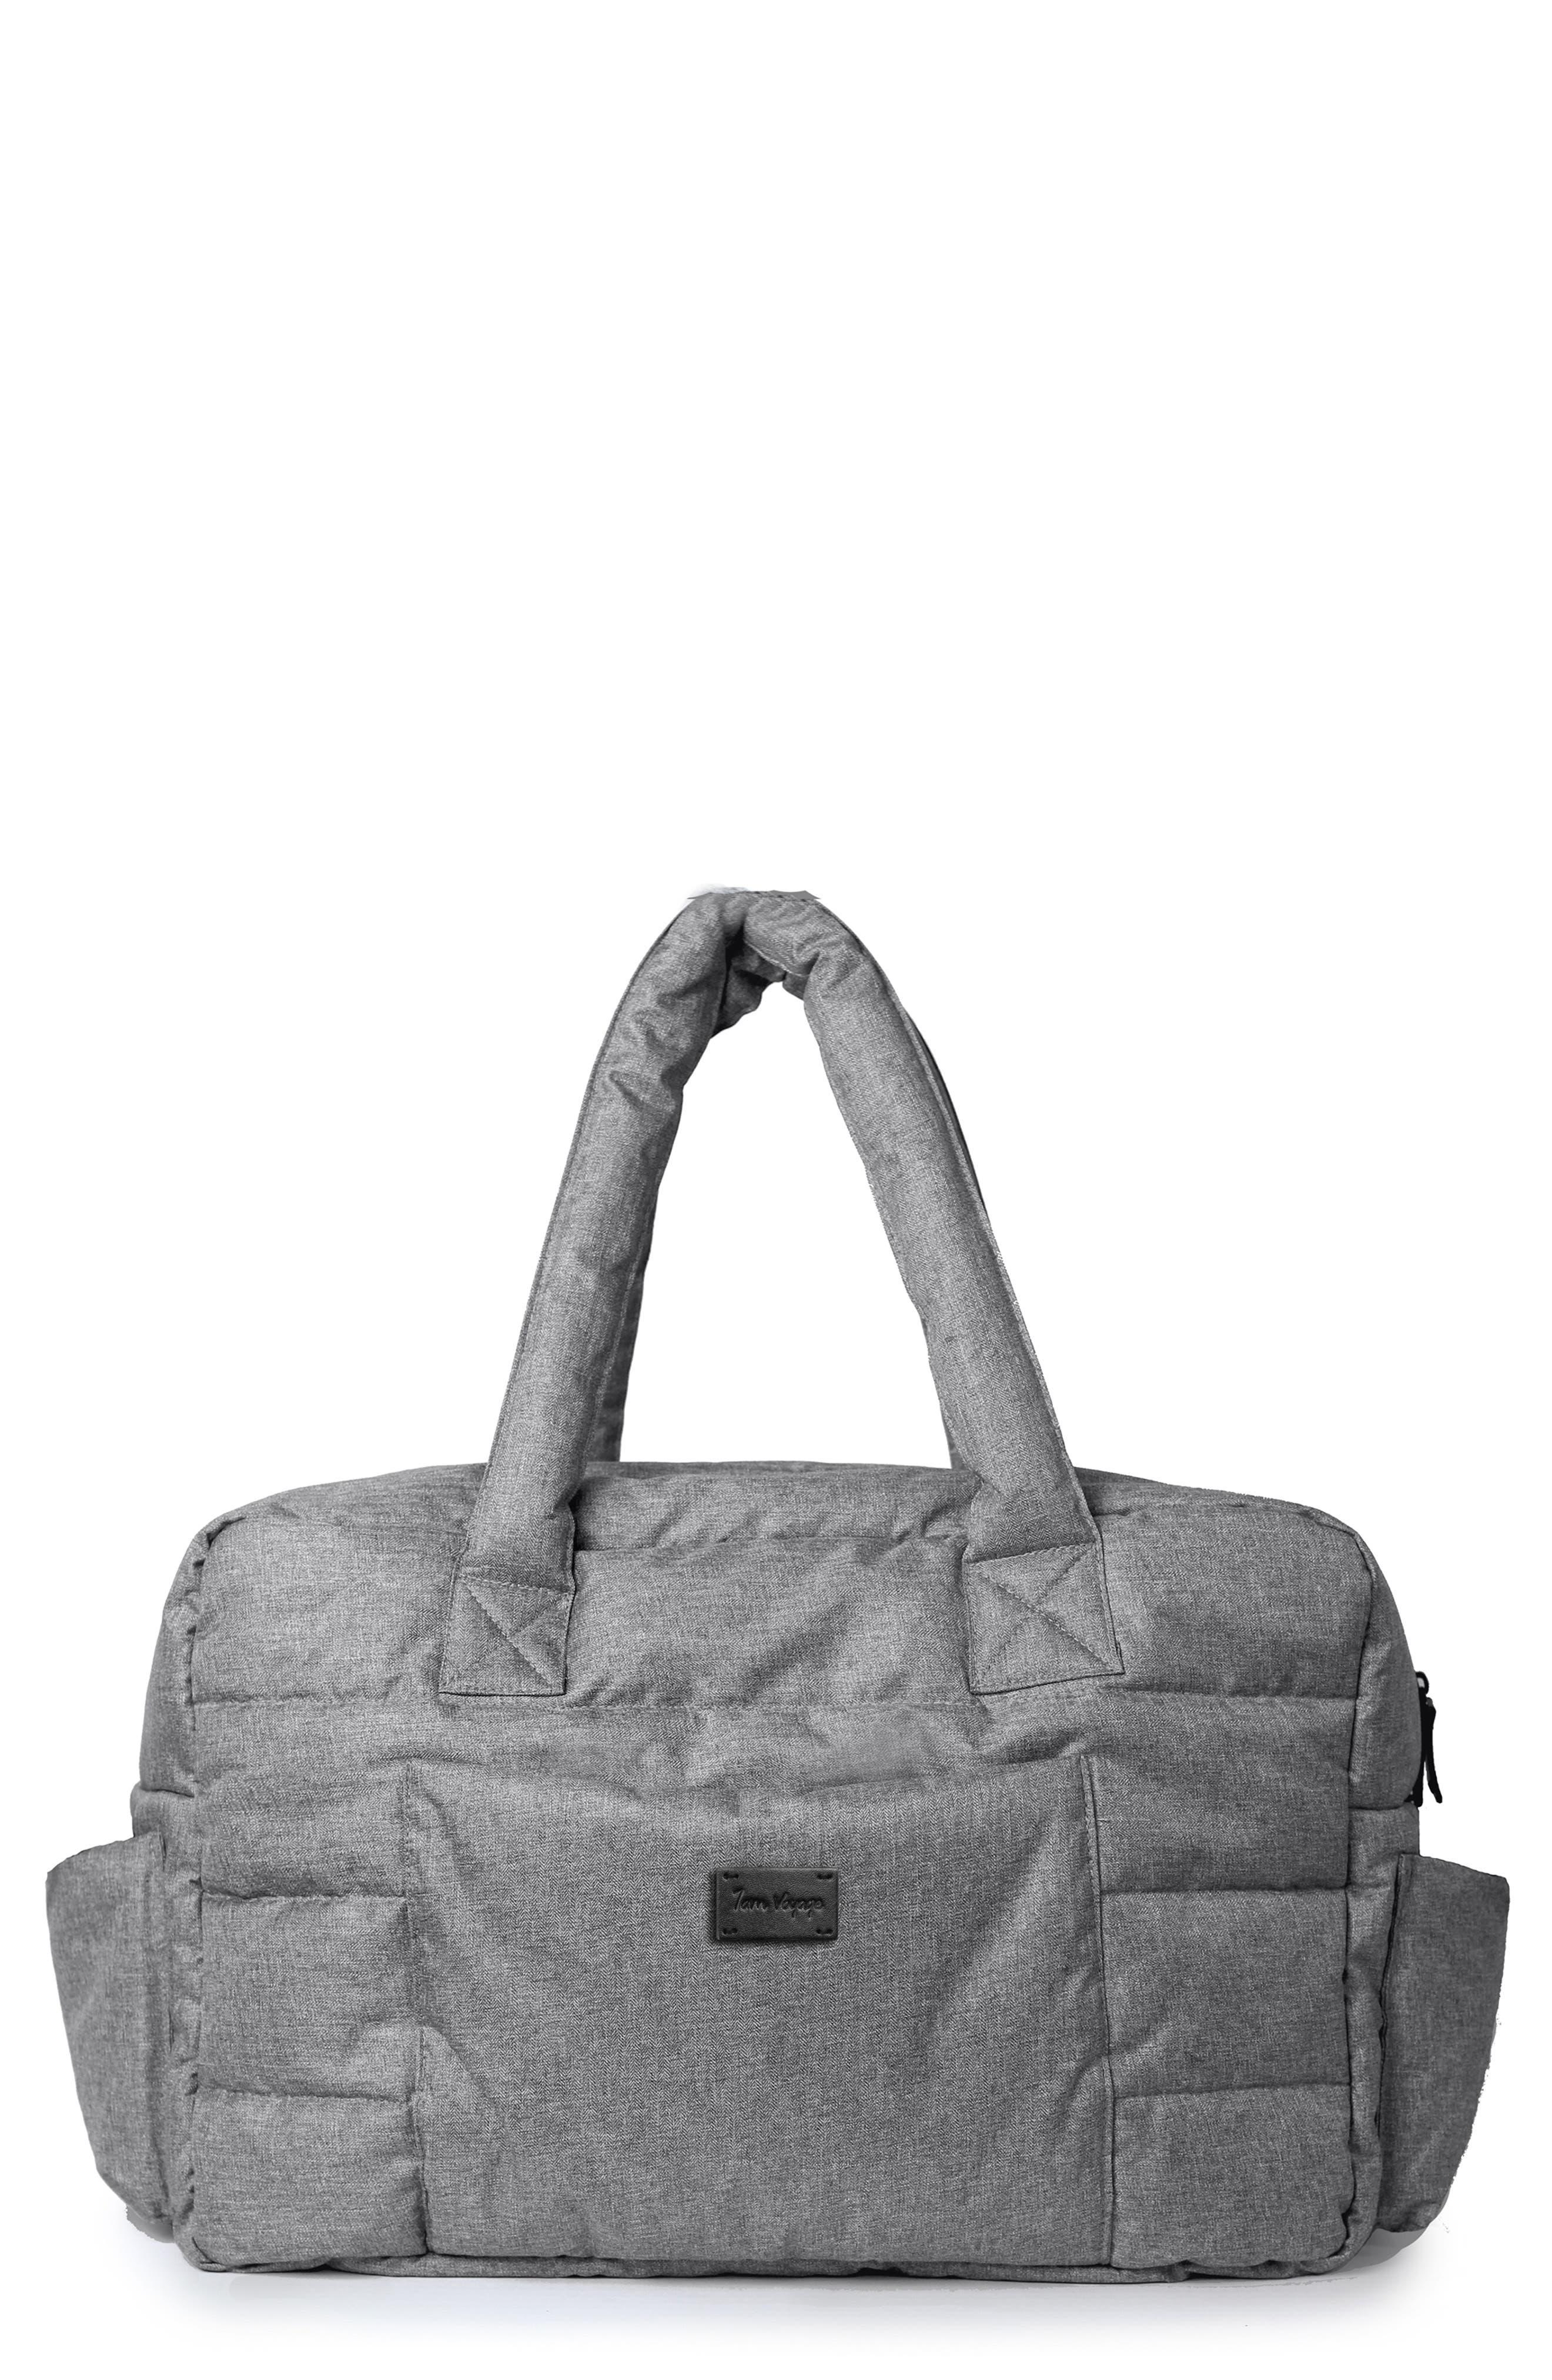 Soho Water Repellent Diaper Bag,                         Main,                         color, 020